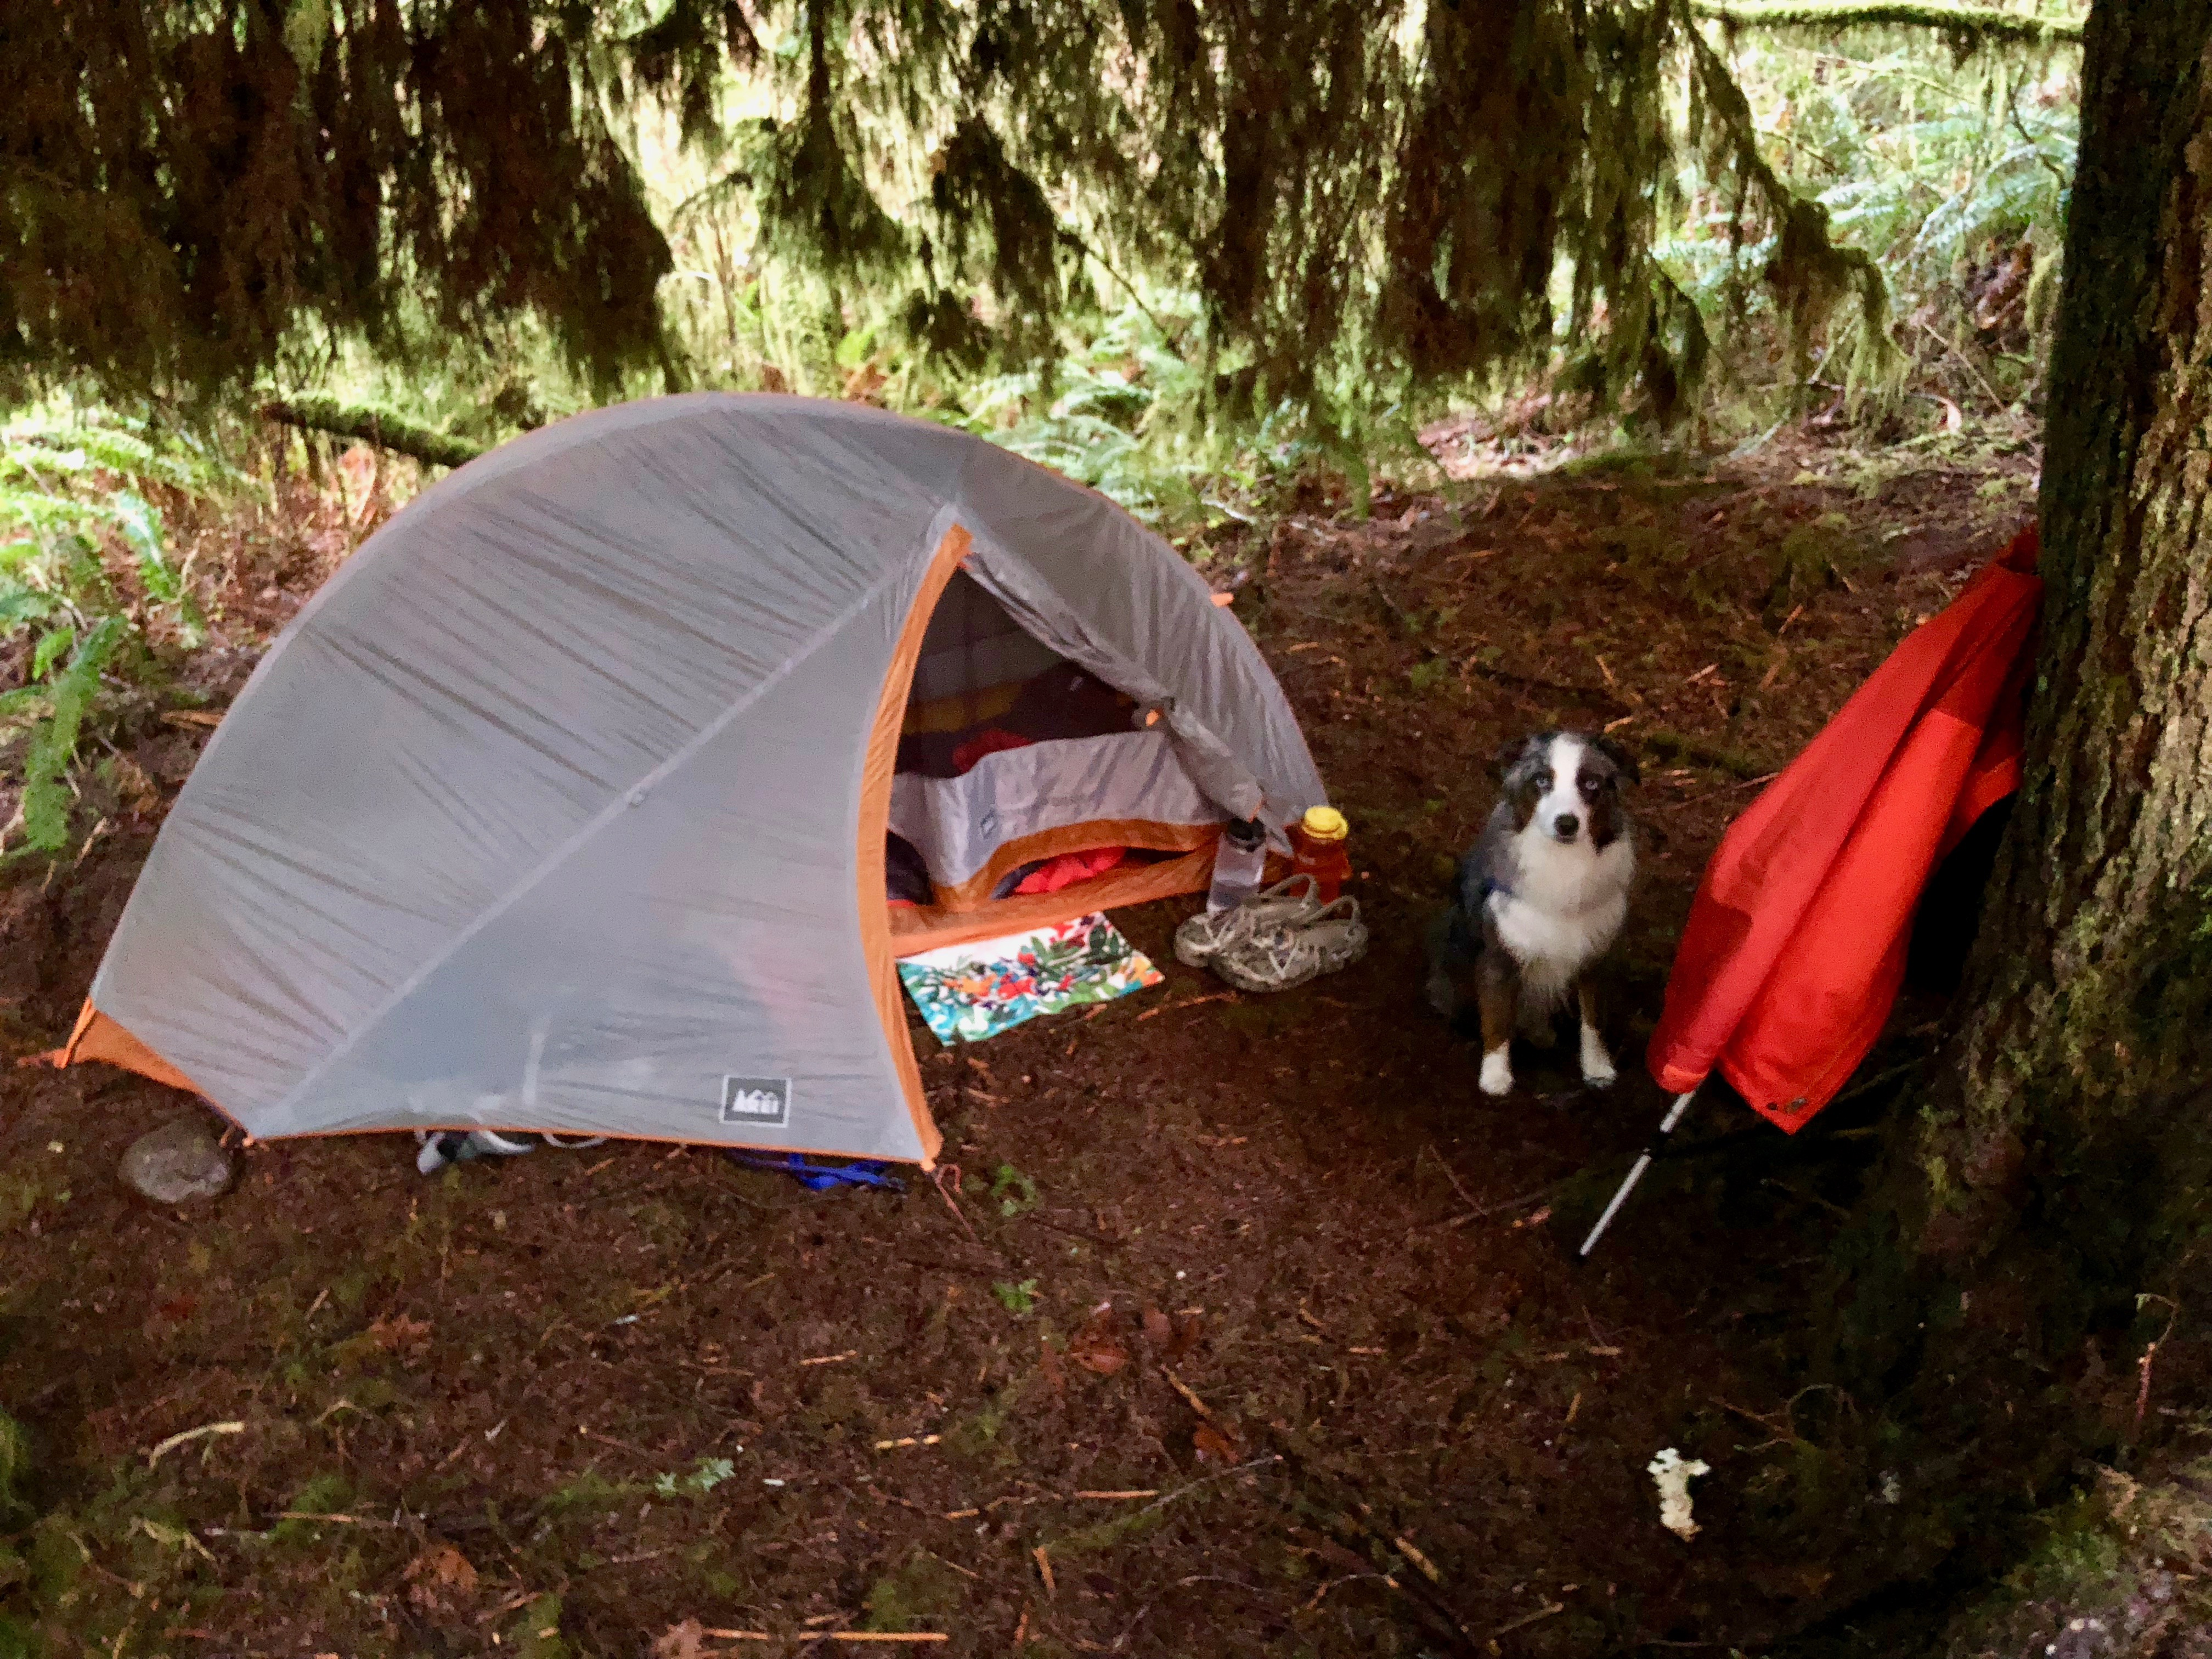 Campsite under tree cover.